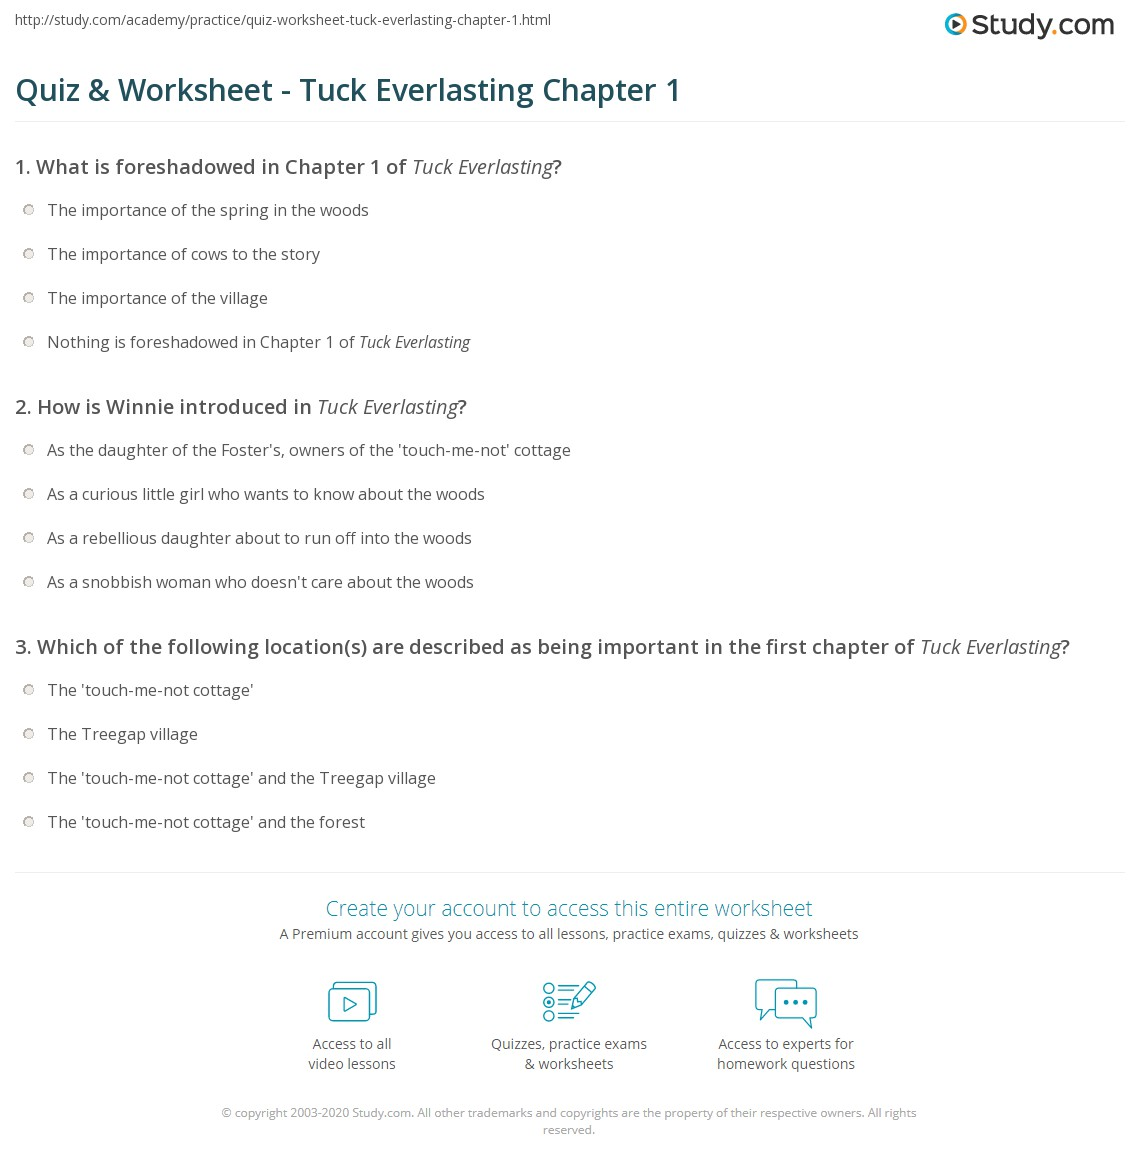 Worksheets Tuck Everlasting Worksheets quiz worksheet tuck everlasting chapter 1 study com print summary worksheet